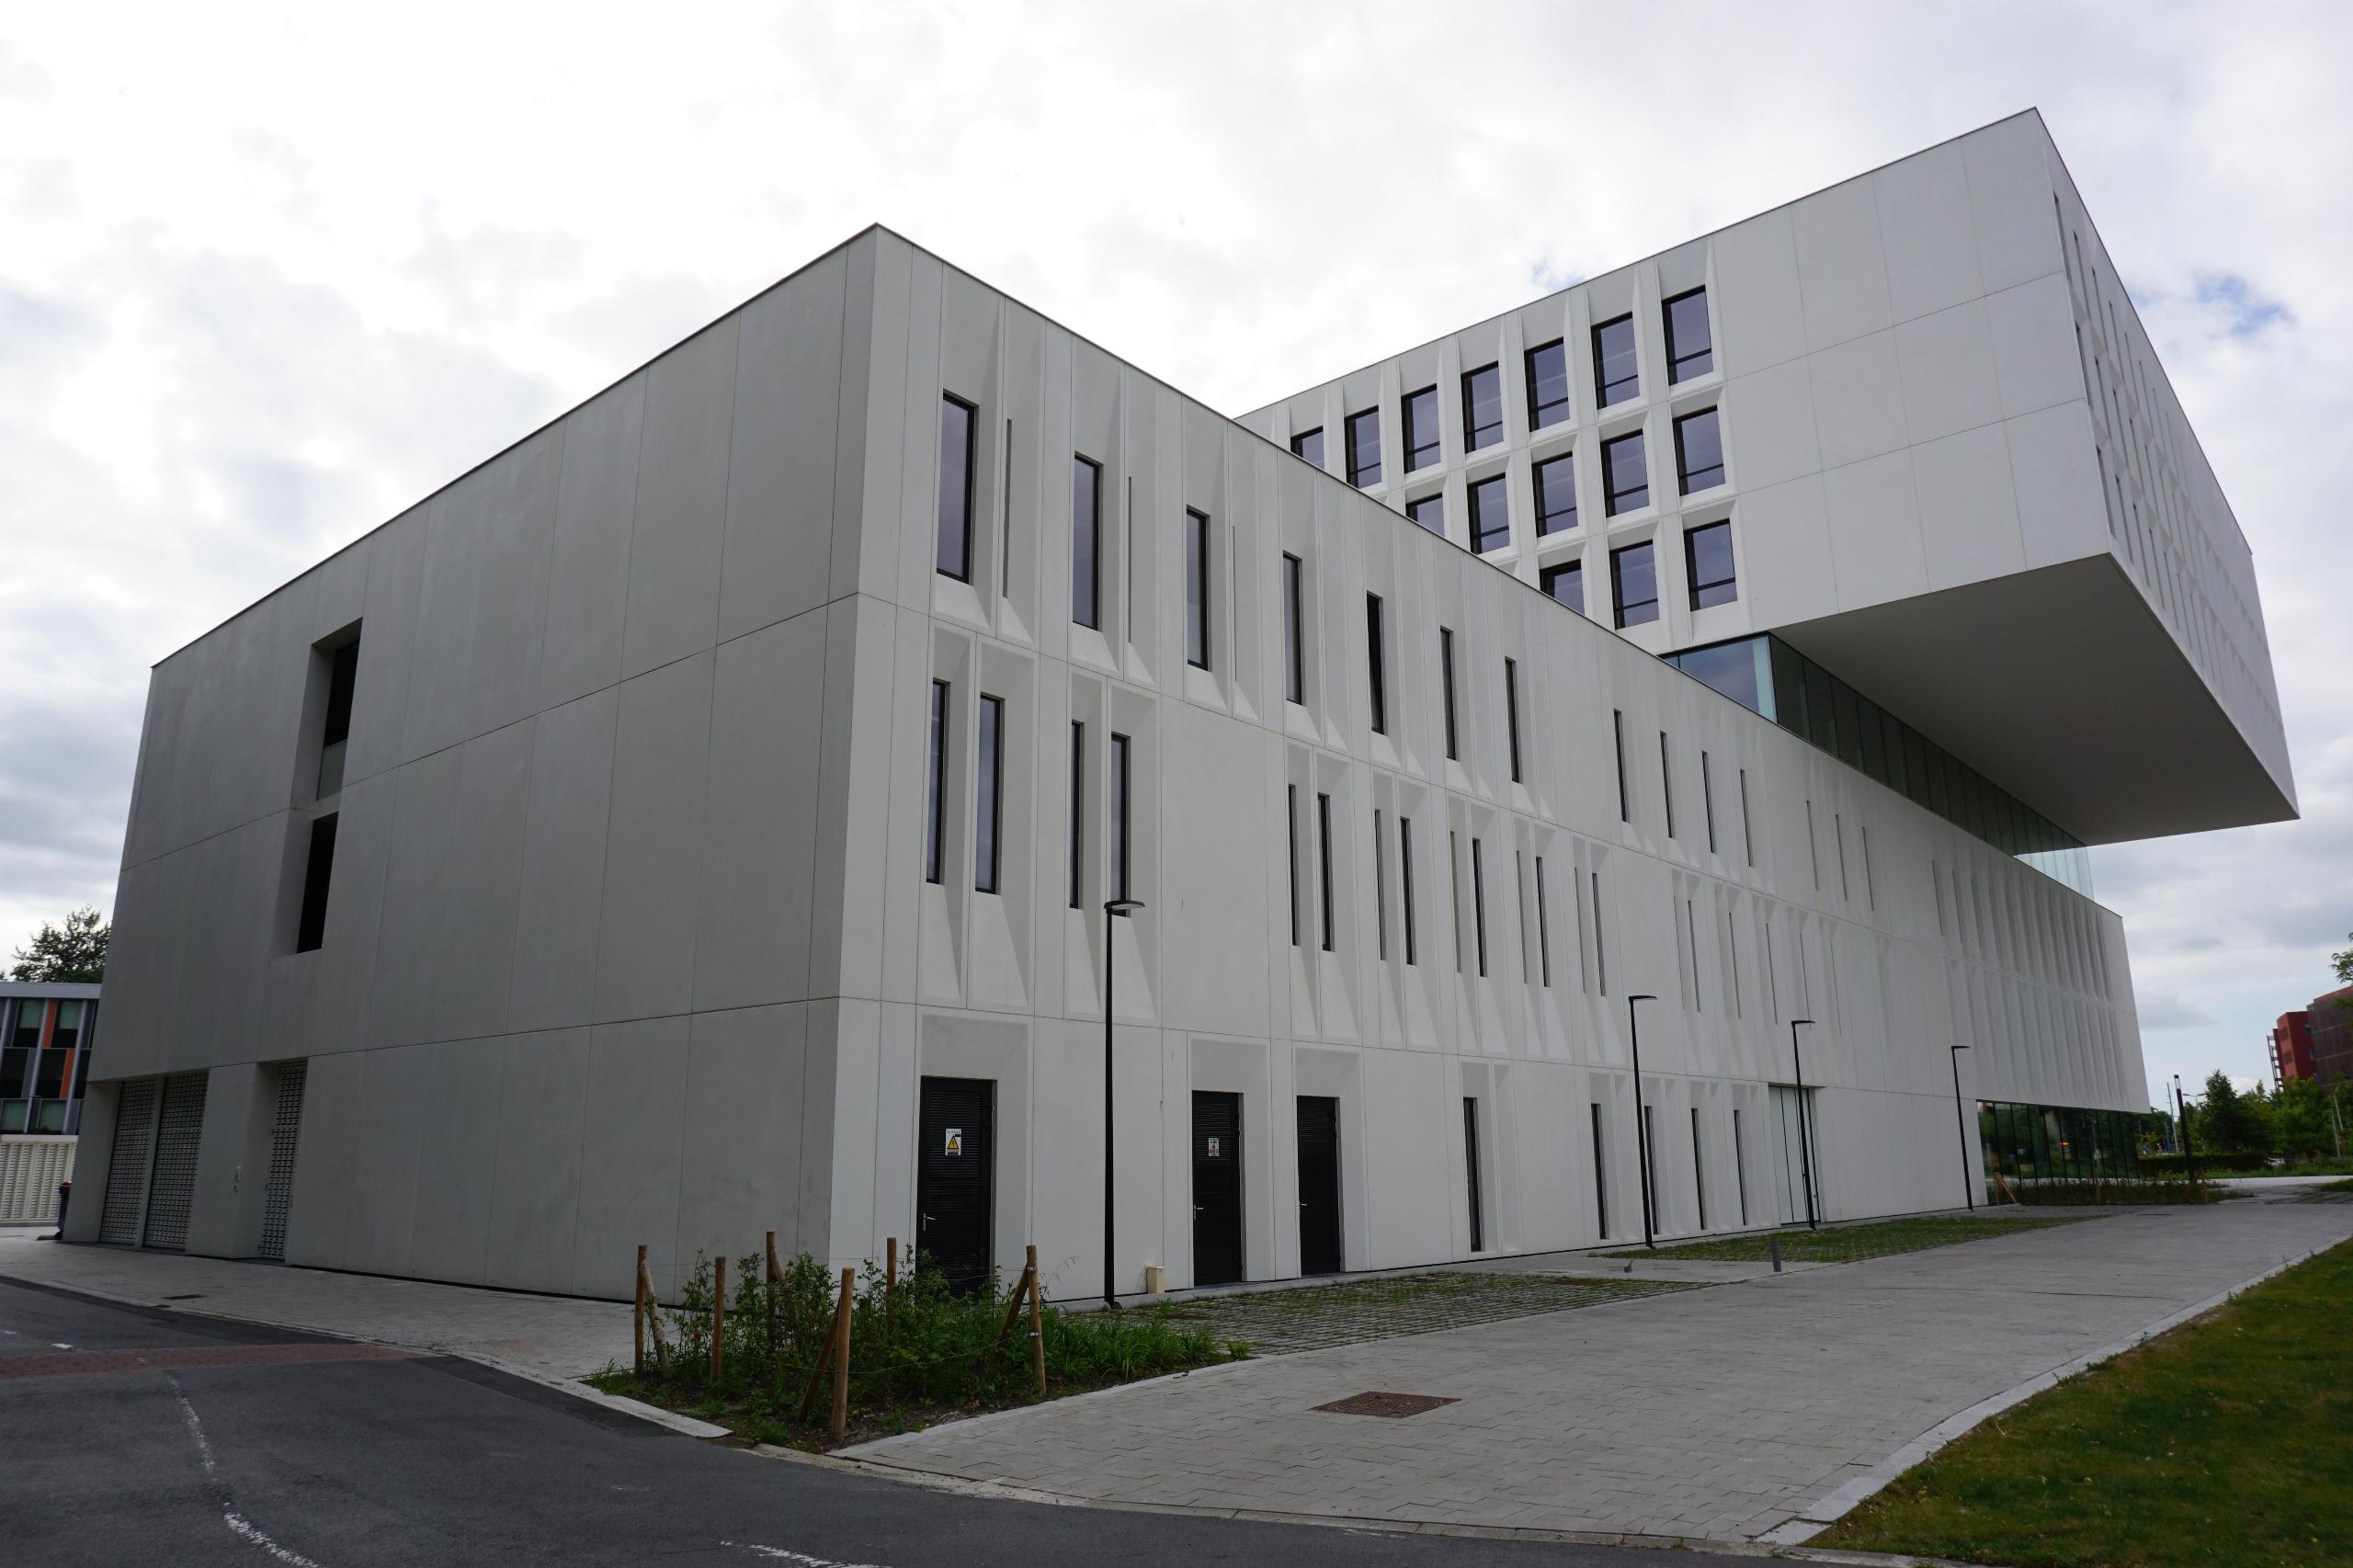 KU Leuven - Campus Brugge - bartvancoillie | ello